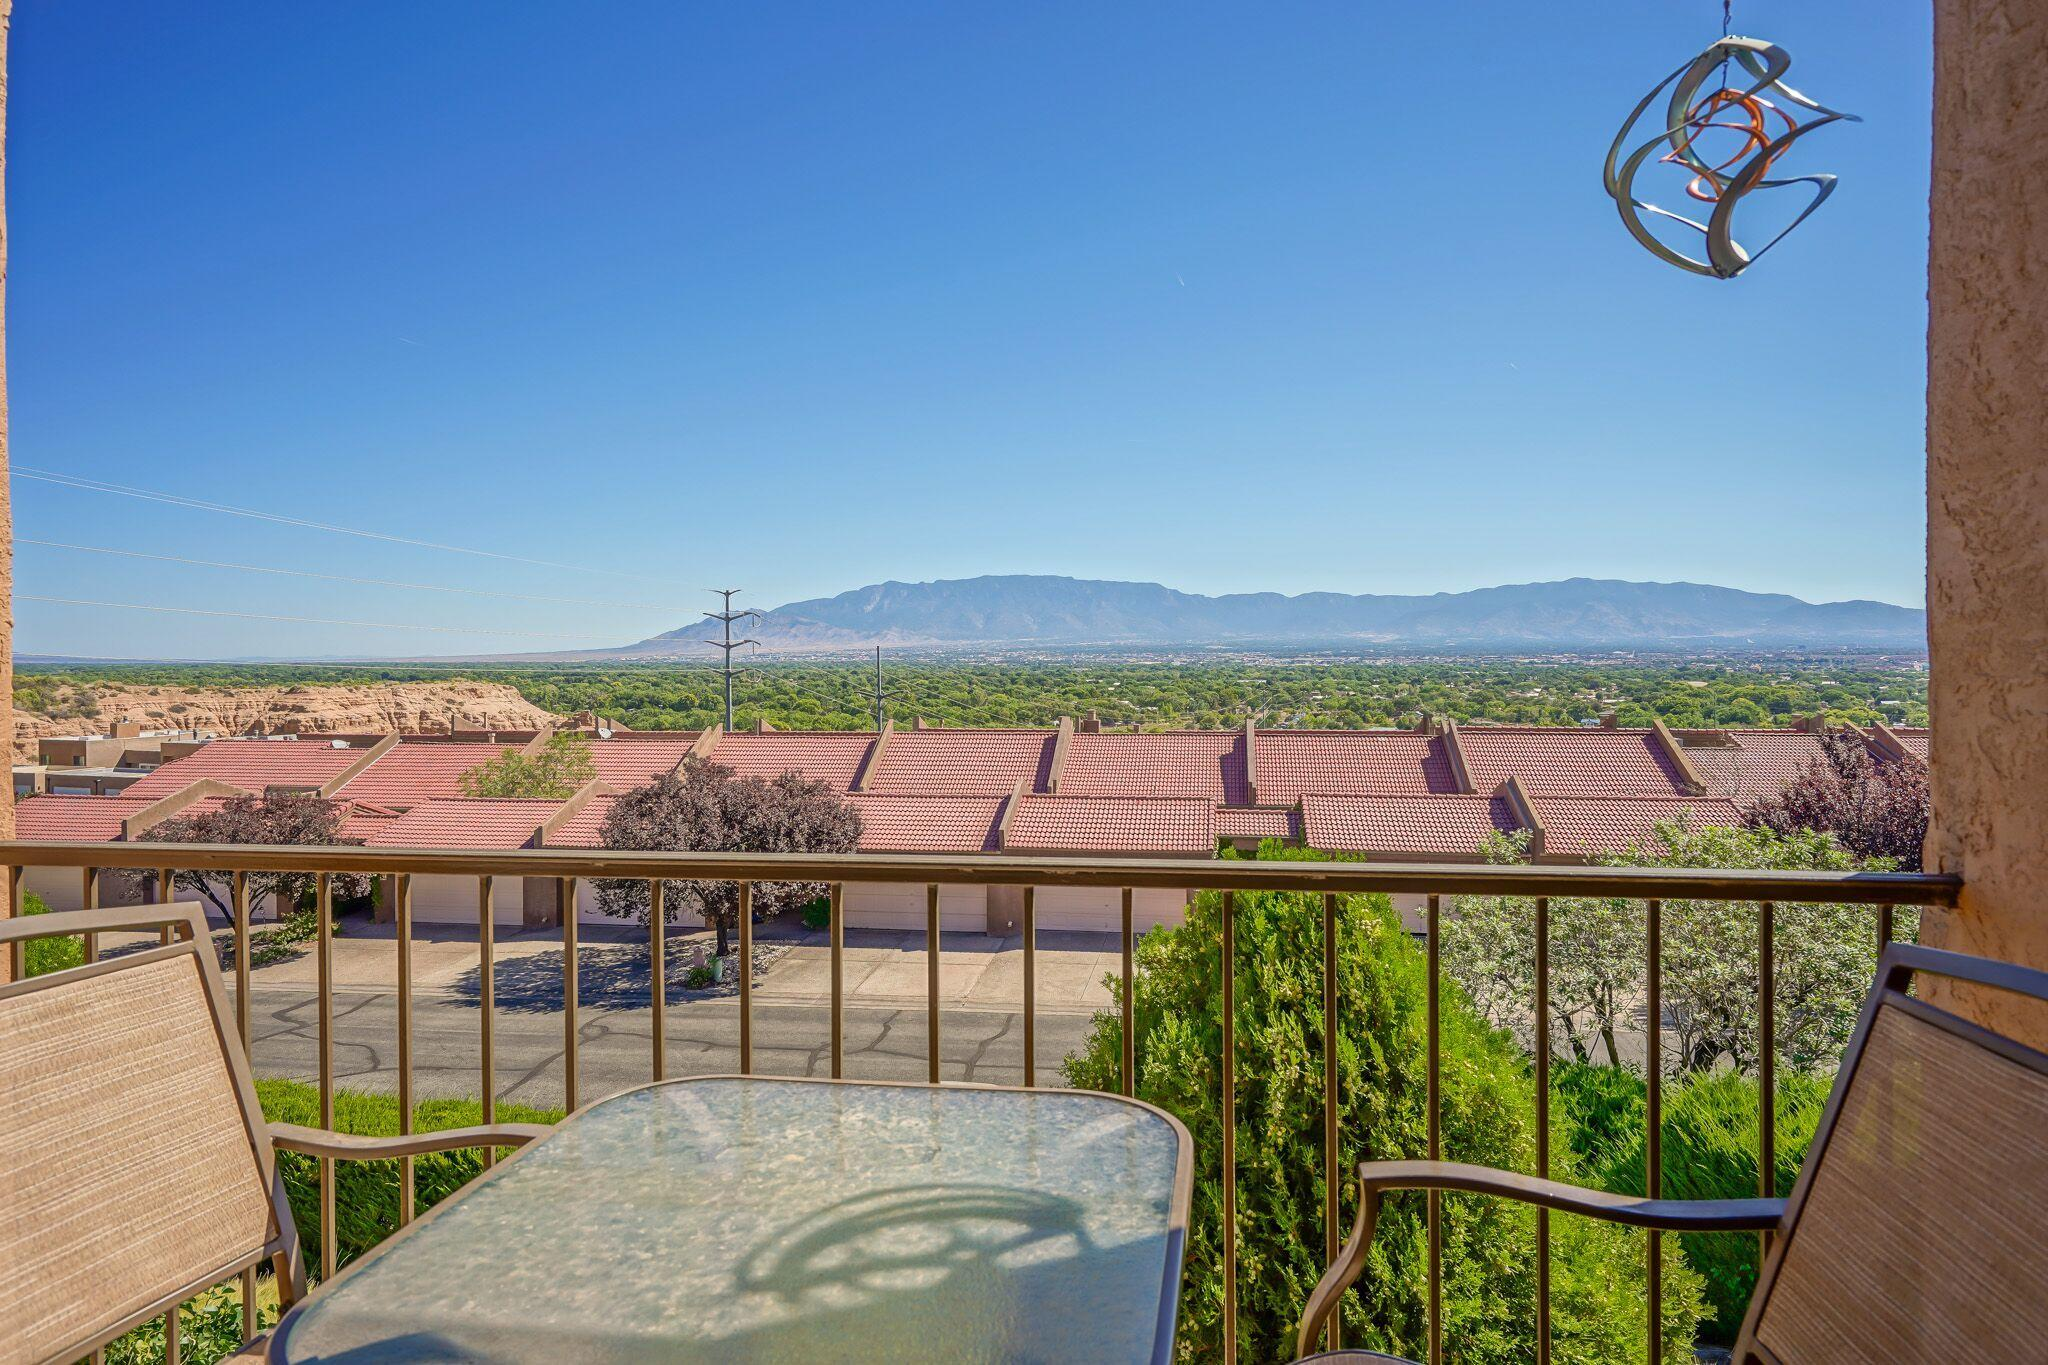 2700 NW Vista Grande Drive, Northwest Albuquerque and Northwest Heights, New Mexico